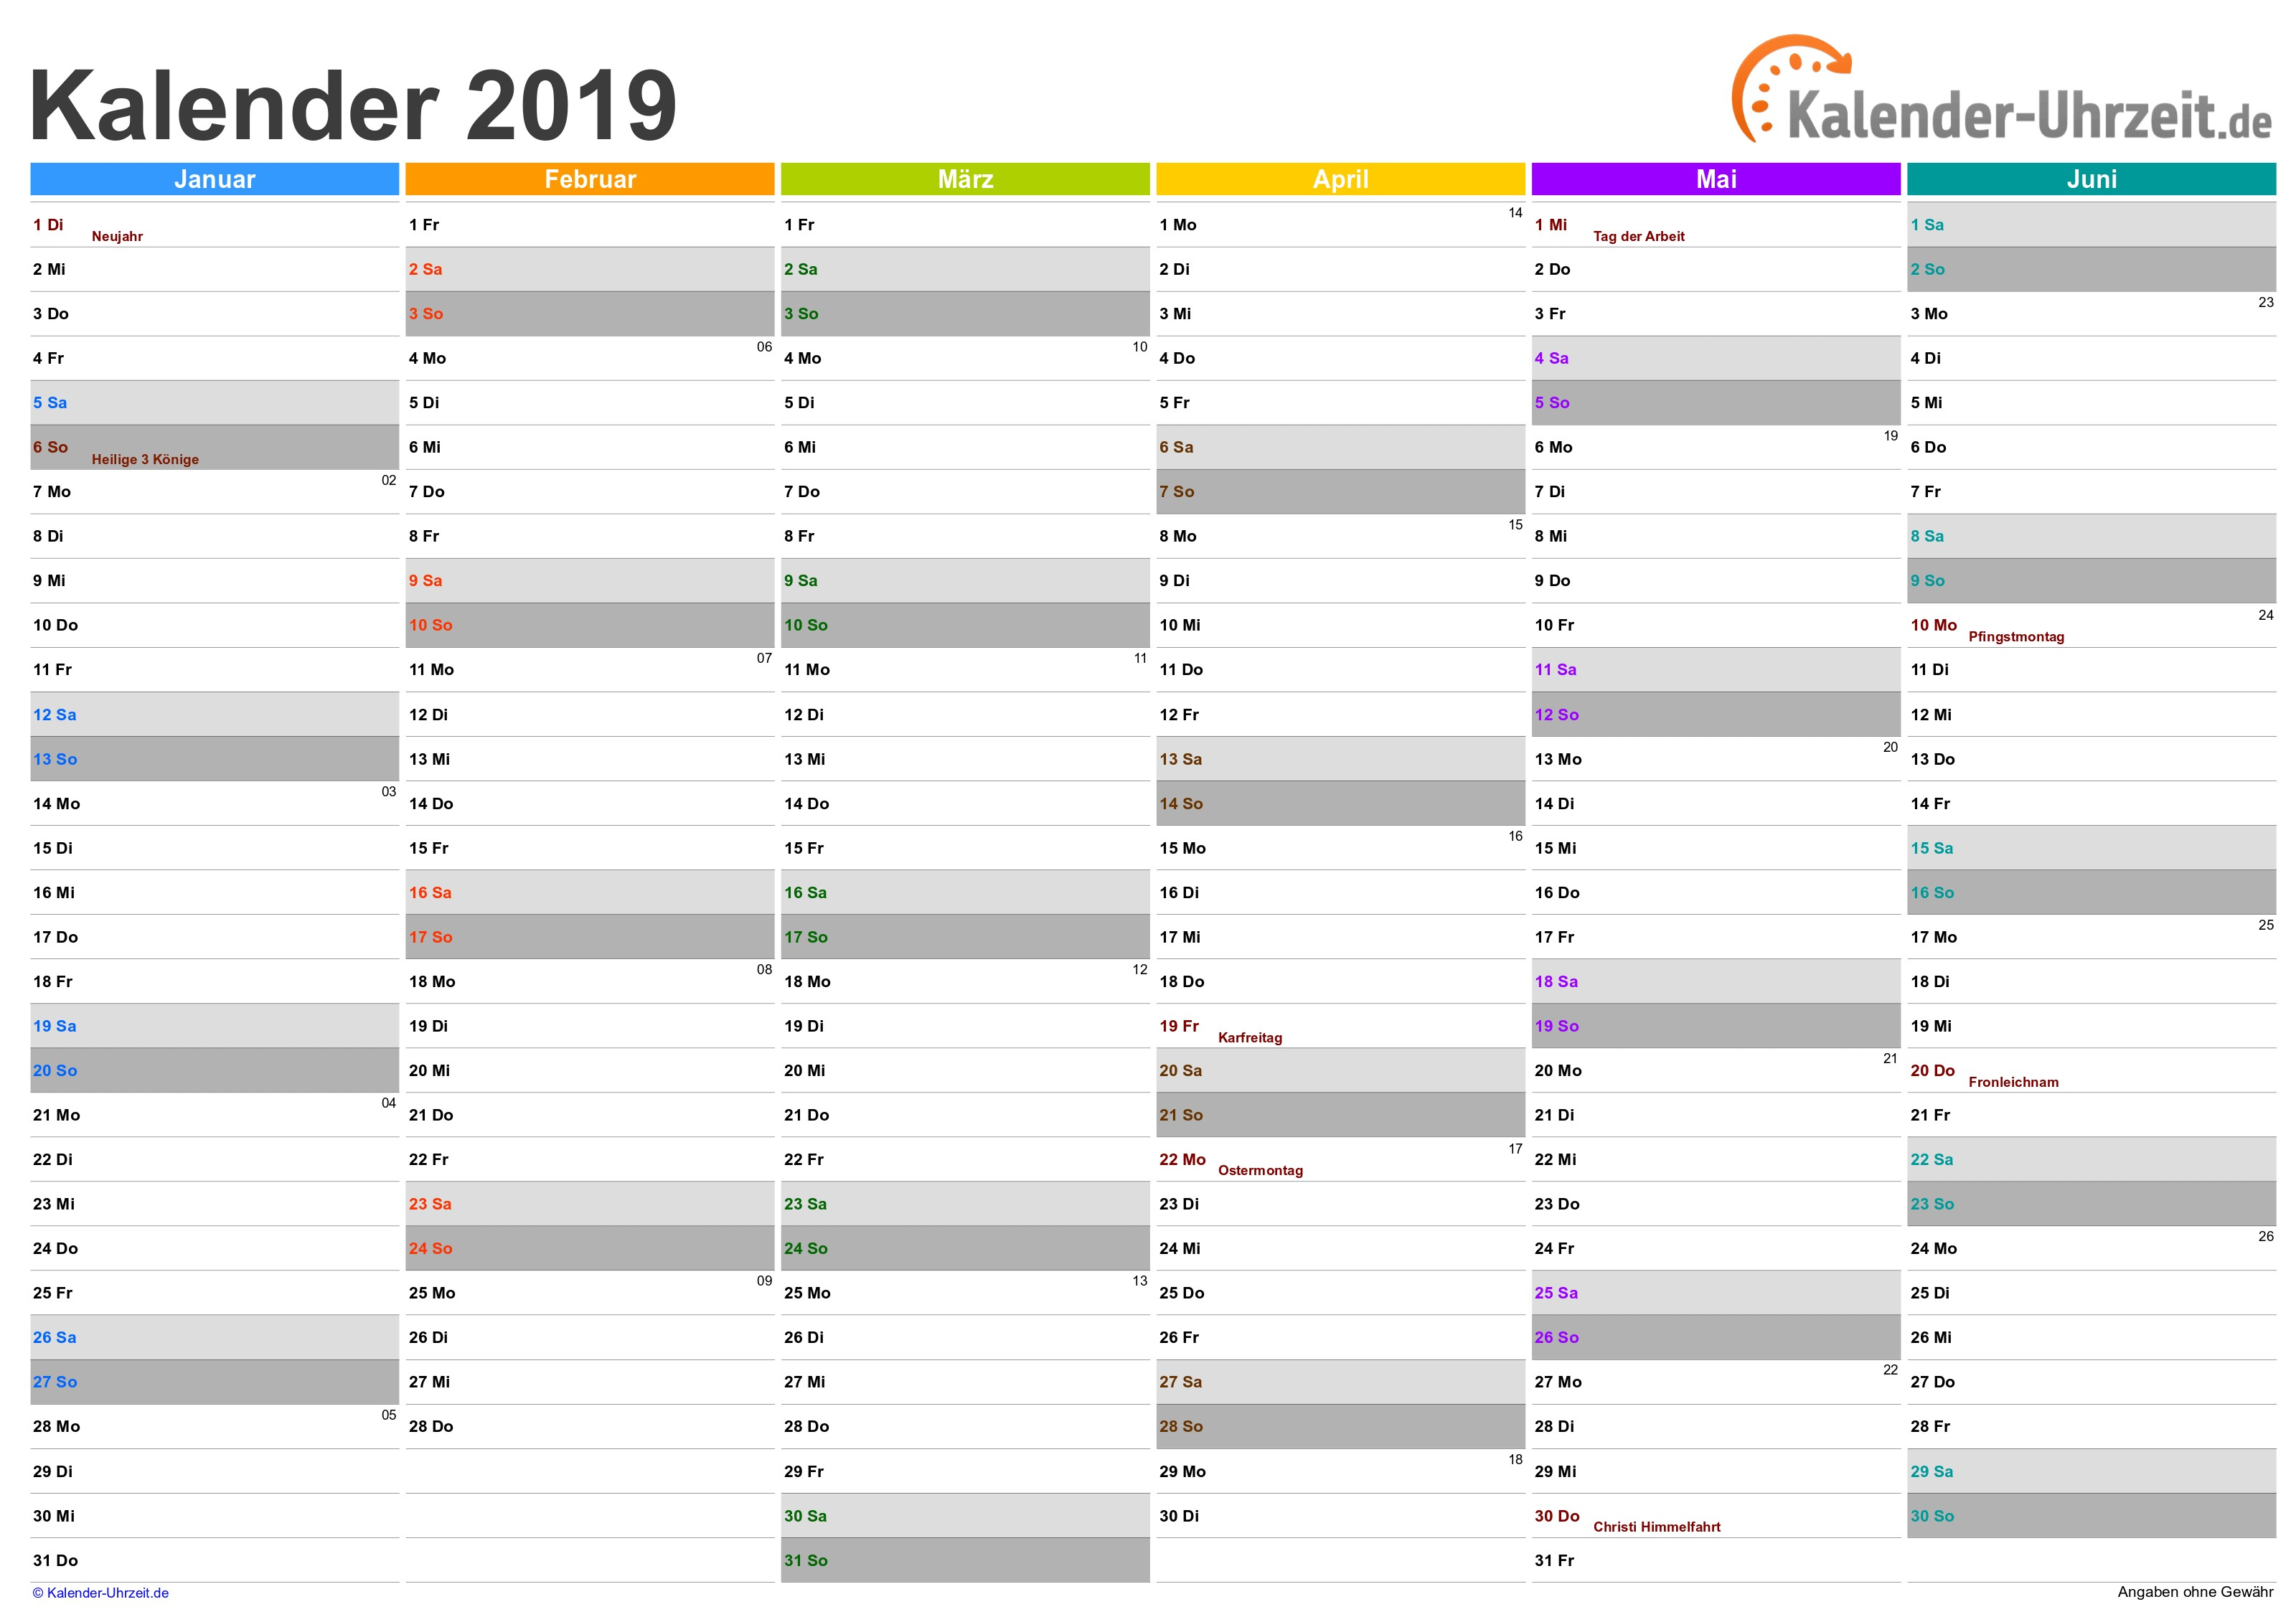 Kalender 2019 Master Mas Populares 10 Best Kalender Vorlage Excel Ideen Calendario 2019